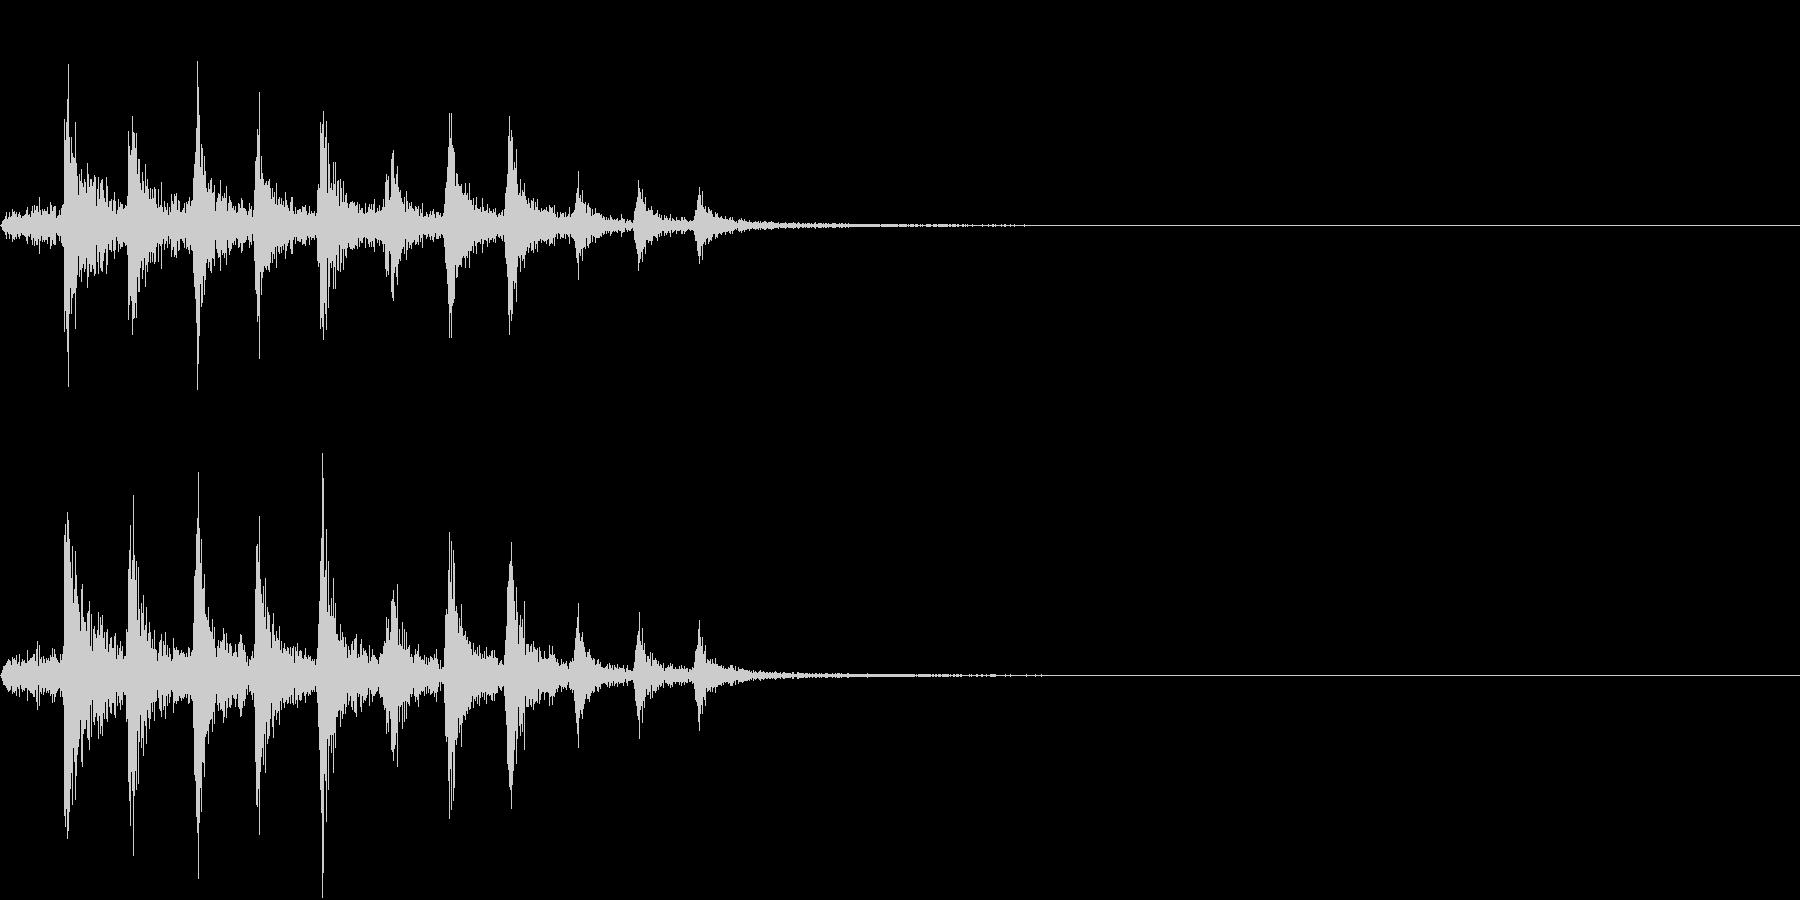 Bicycle 自転車のチェーンの音の未再生の波形